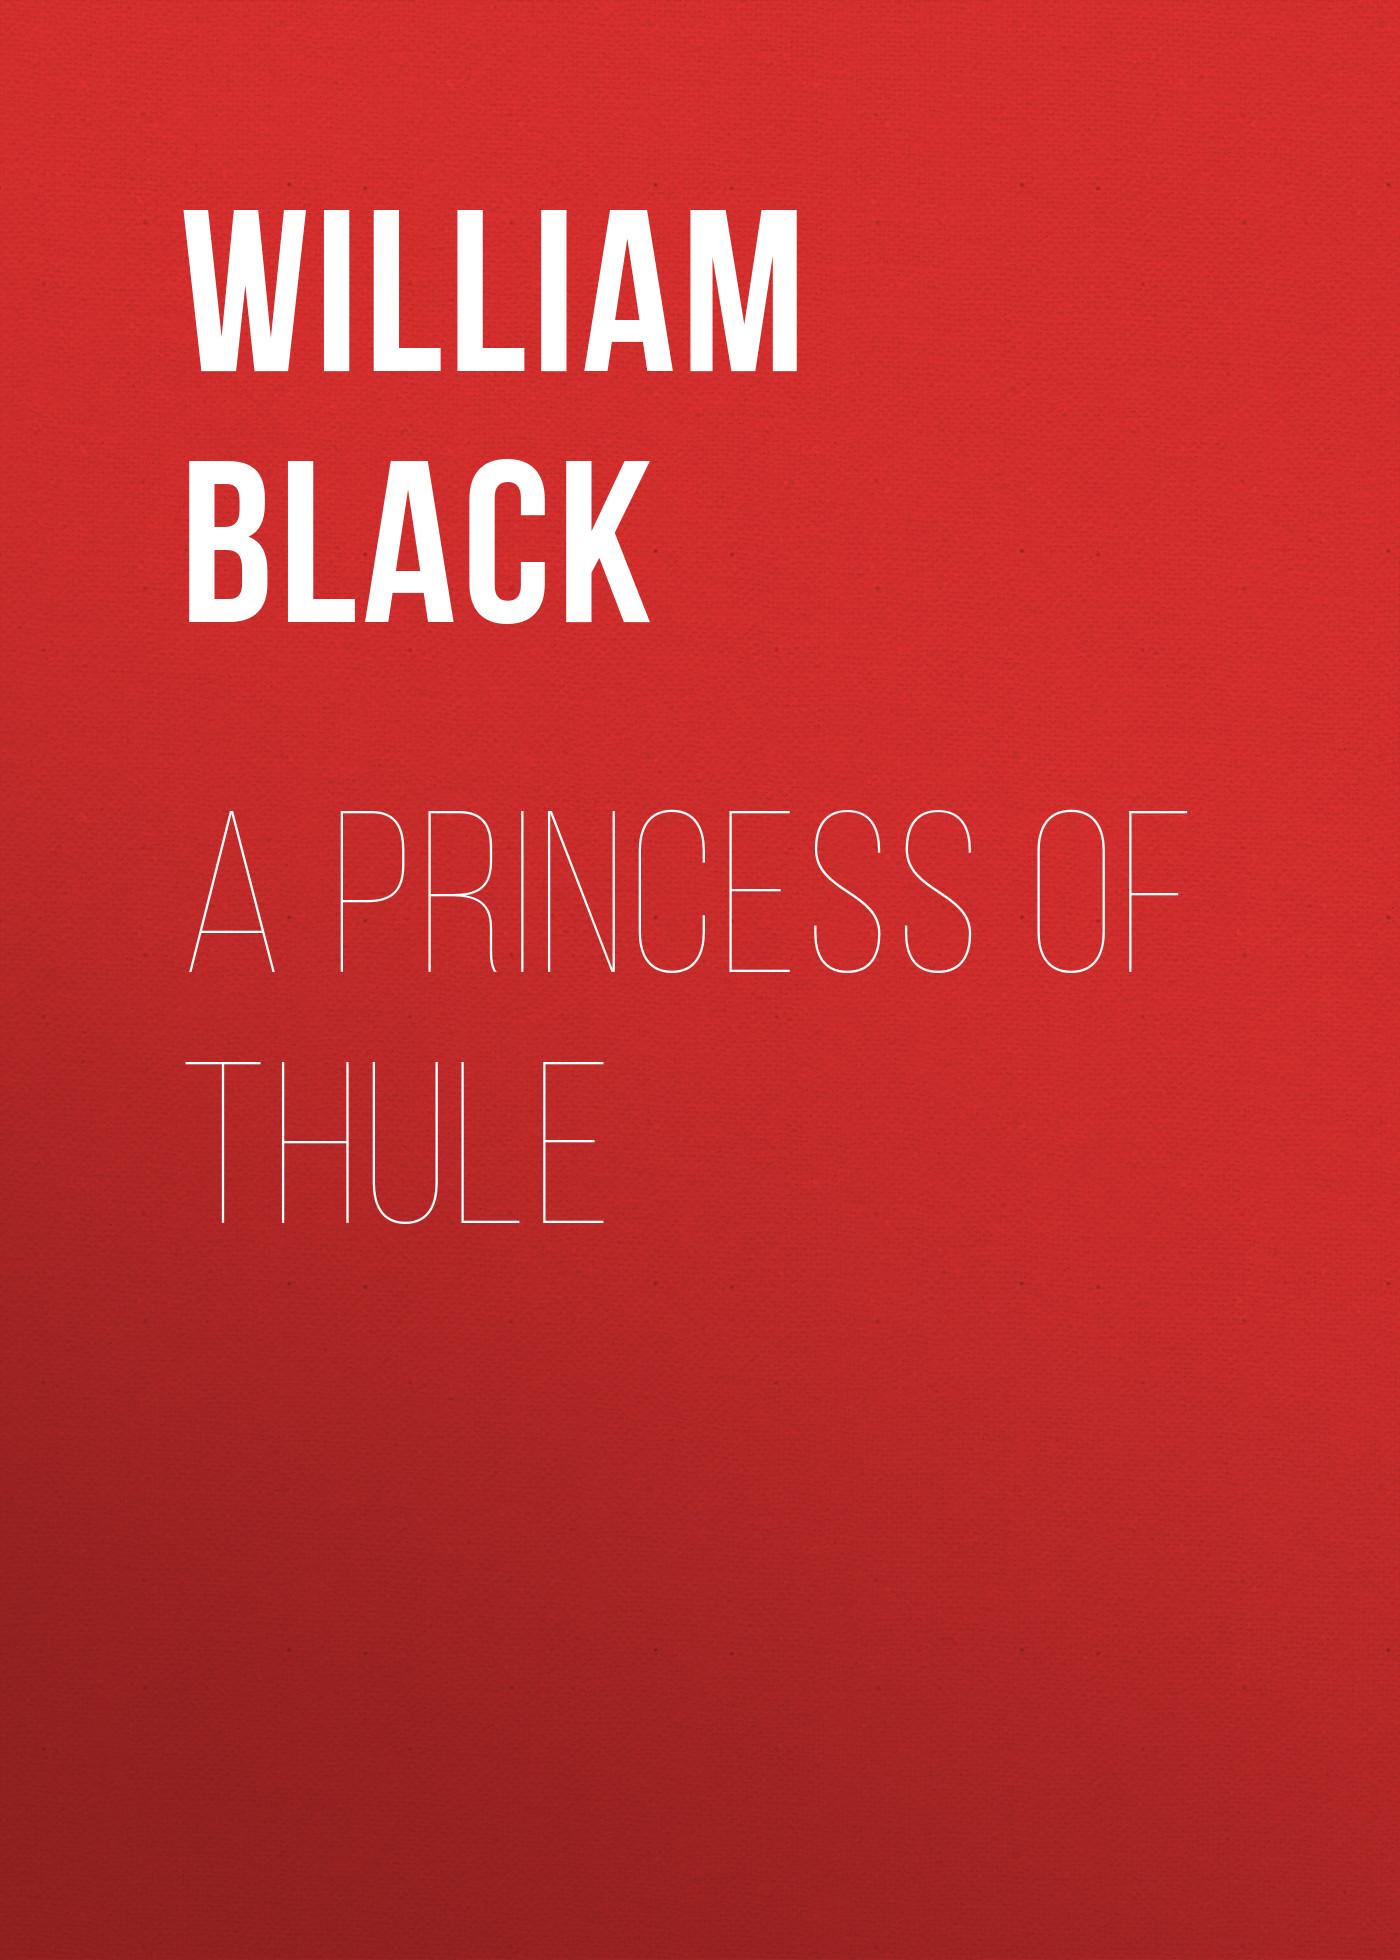 Black William A Princess of Thule cosplay sexy princess dress black